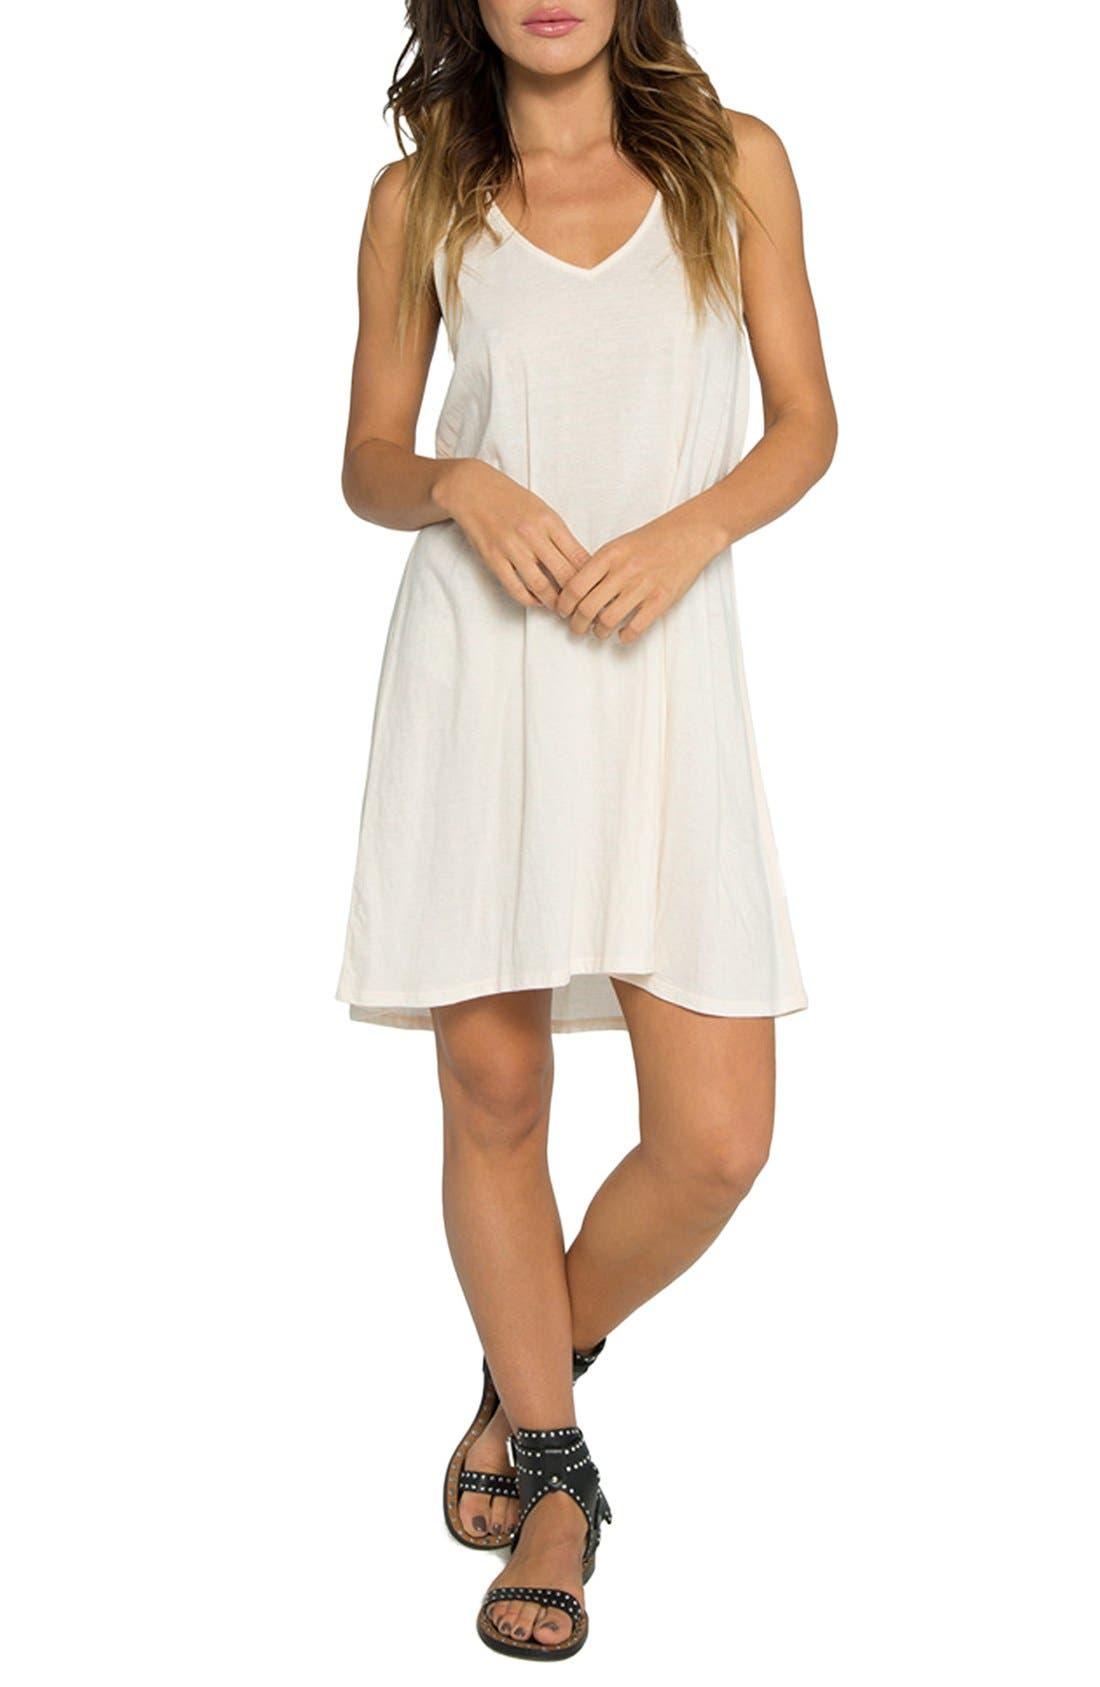 Alternate Image 1 Selected - TAVIK 'Mila' Knit Racerback Dress